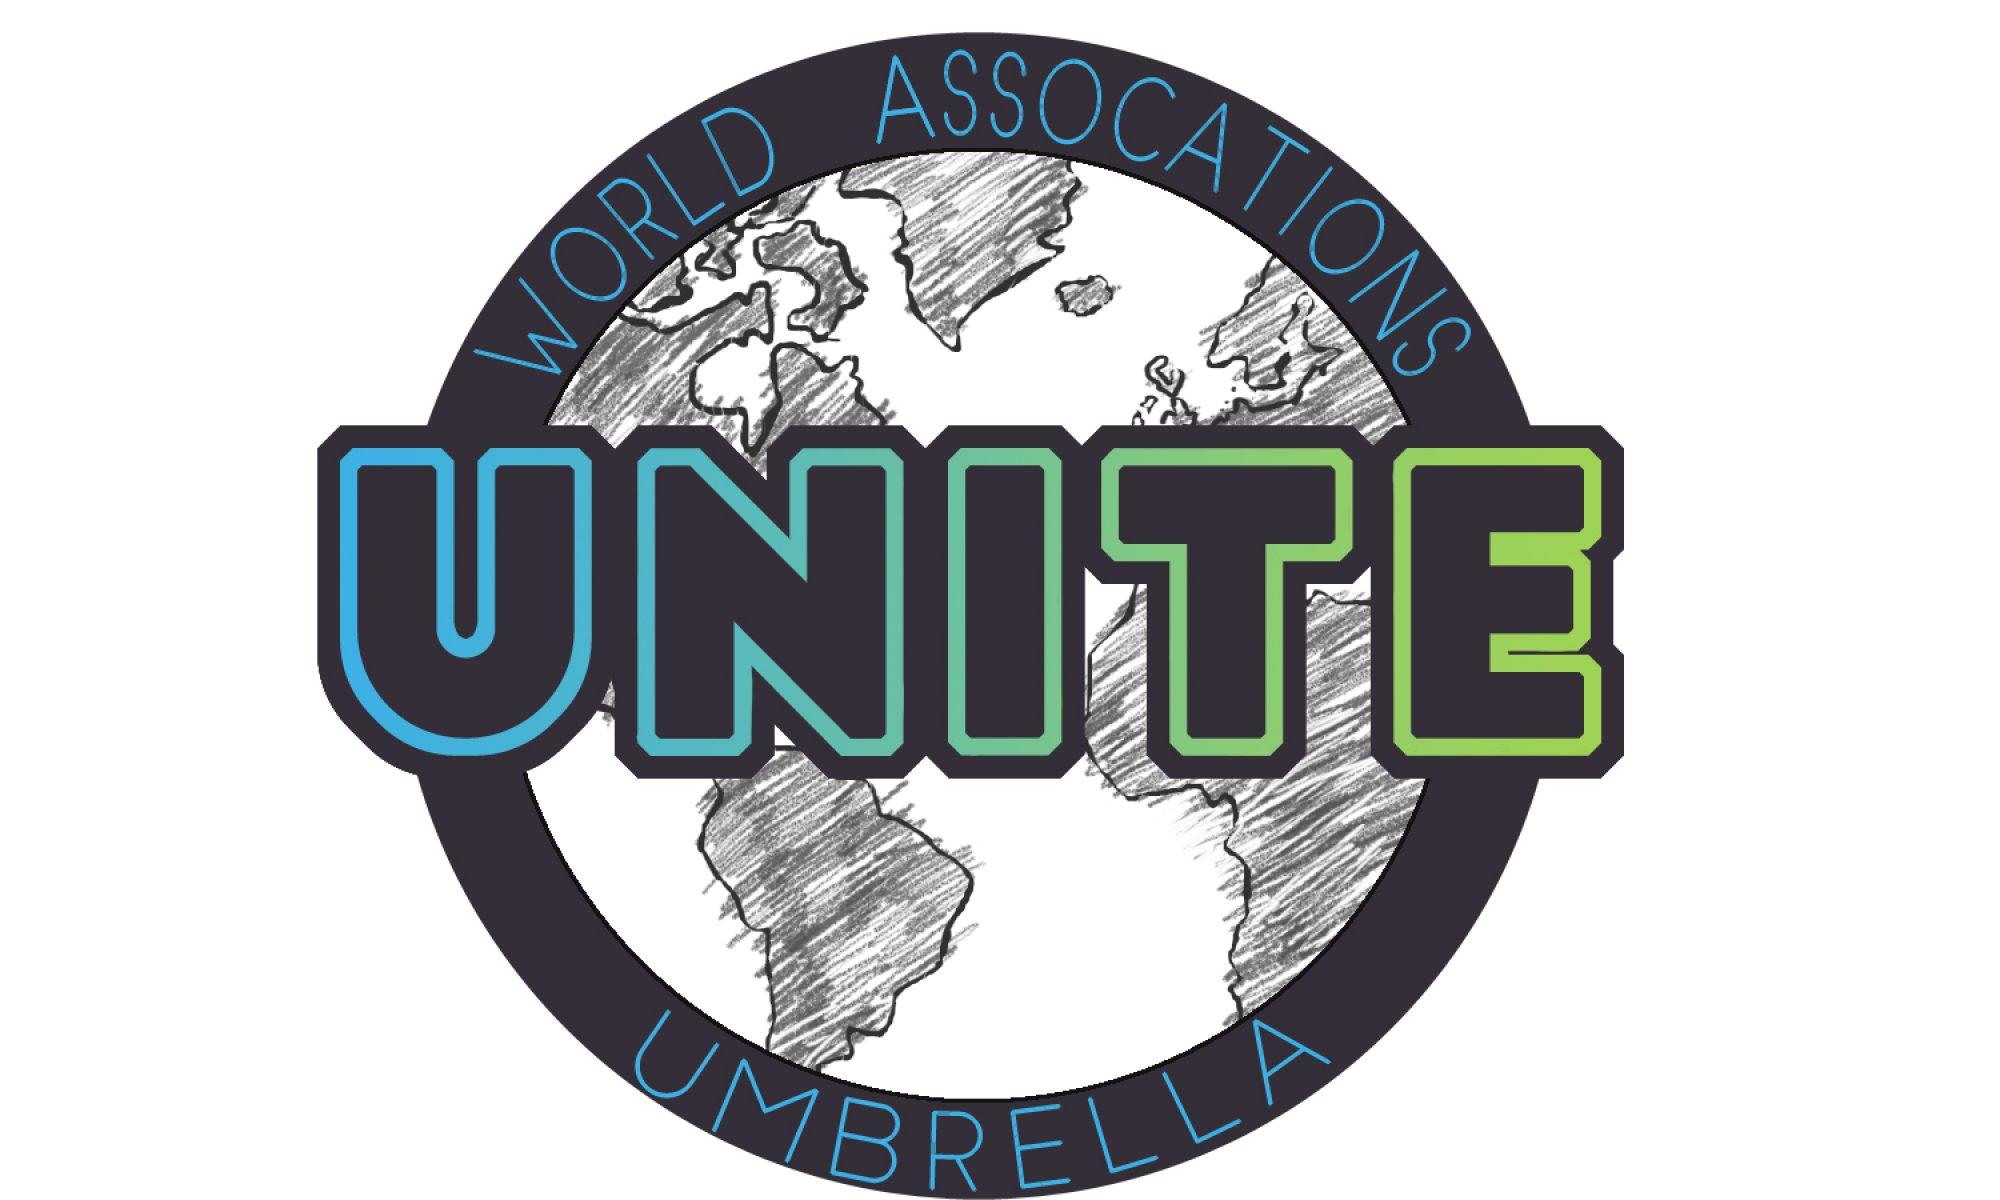 UniTe - University of Twente